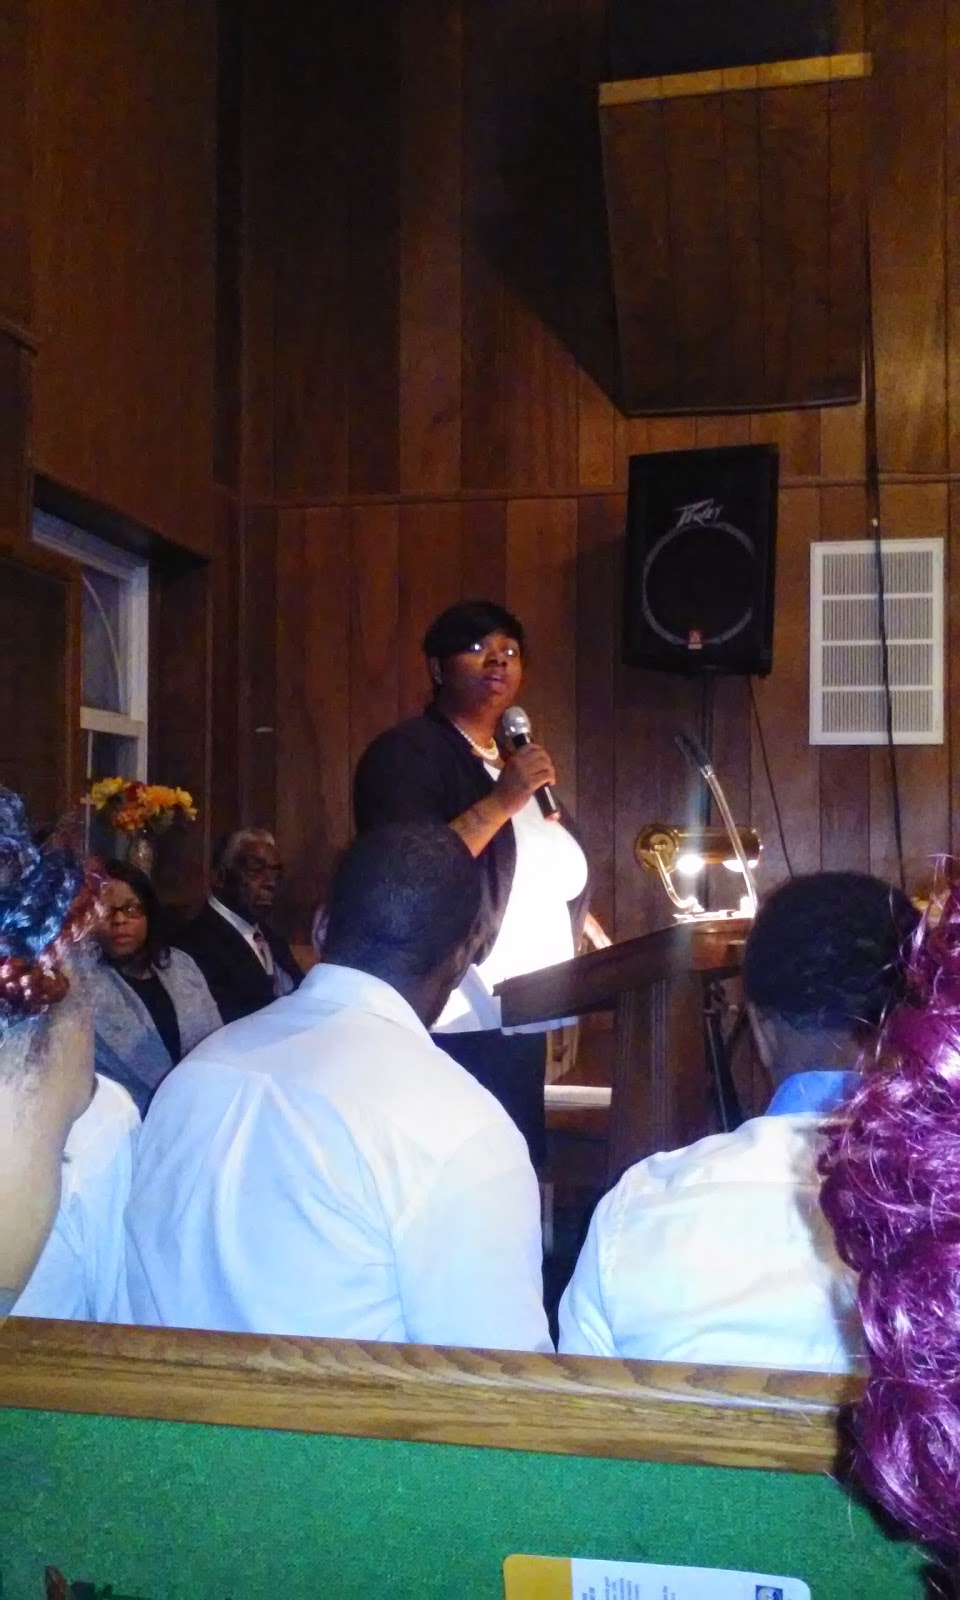 Green Pasture Baptist Church - church  | Photo 7 of 10 | Address: 50 N Maple Ave, East Orange, NJ 07017, USA | Phone: (973) 678-4370